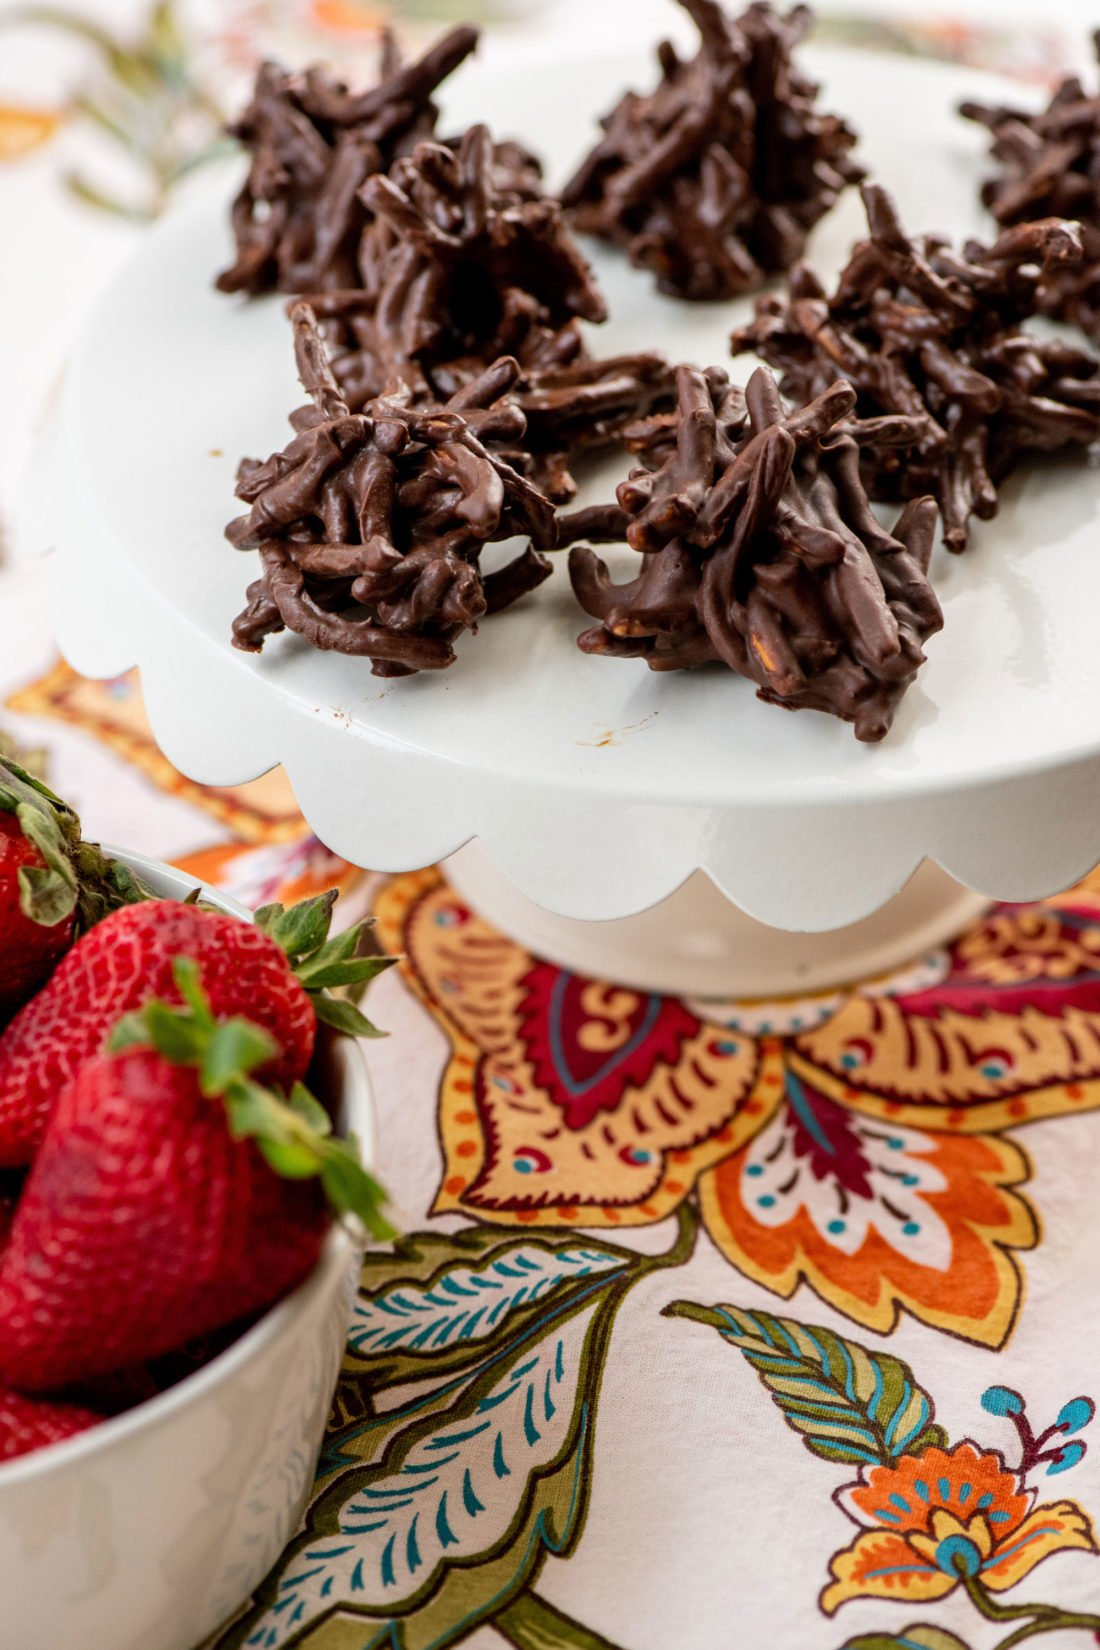 Chocolate, Peanut and Pretzel No-Bake Haystack Cookies / Photo by Cheyenne Cohen / Katie Workman / themom100.com